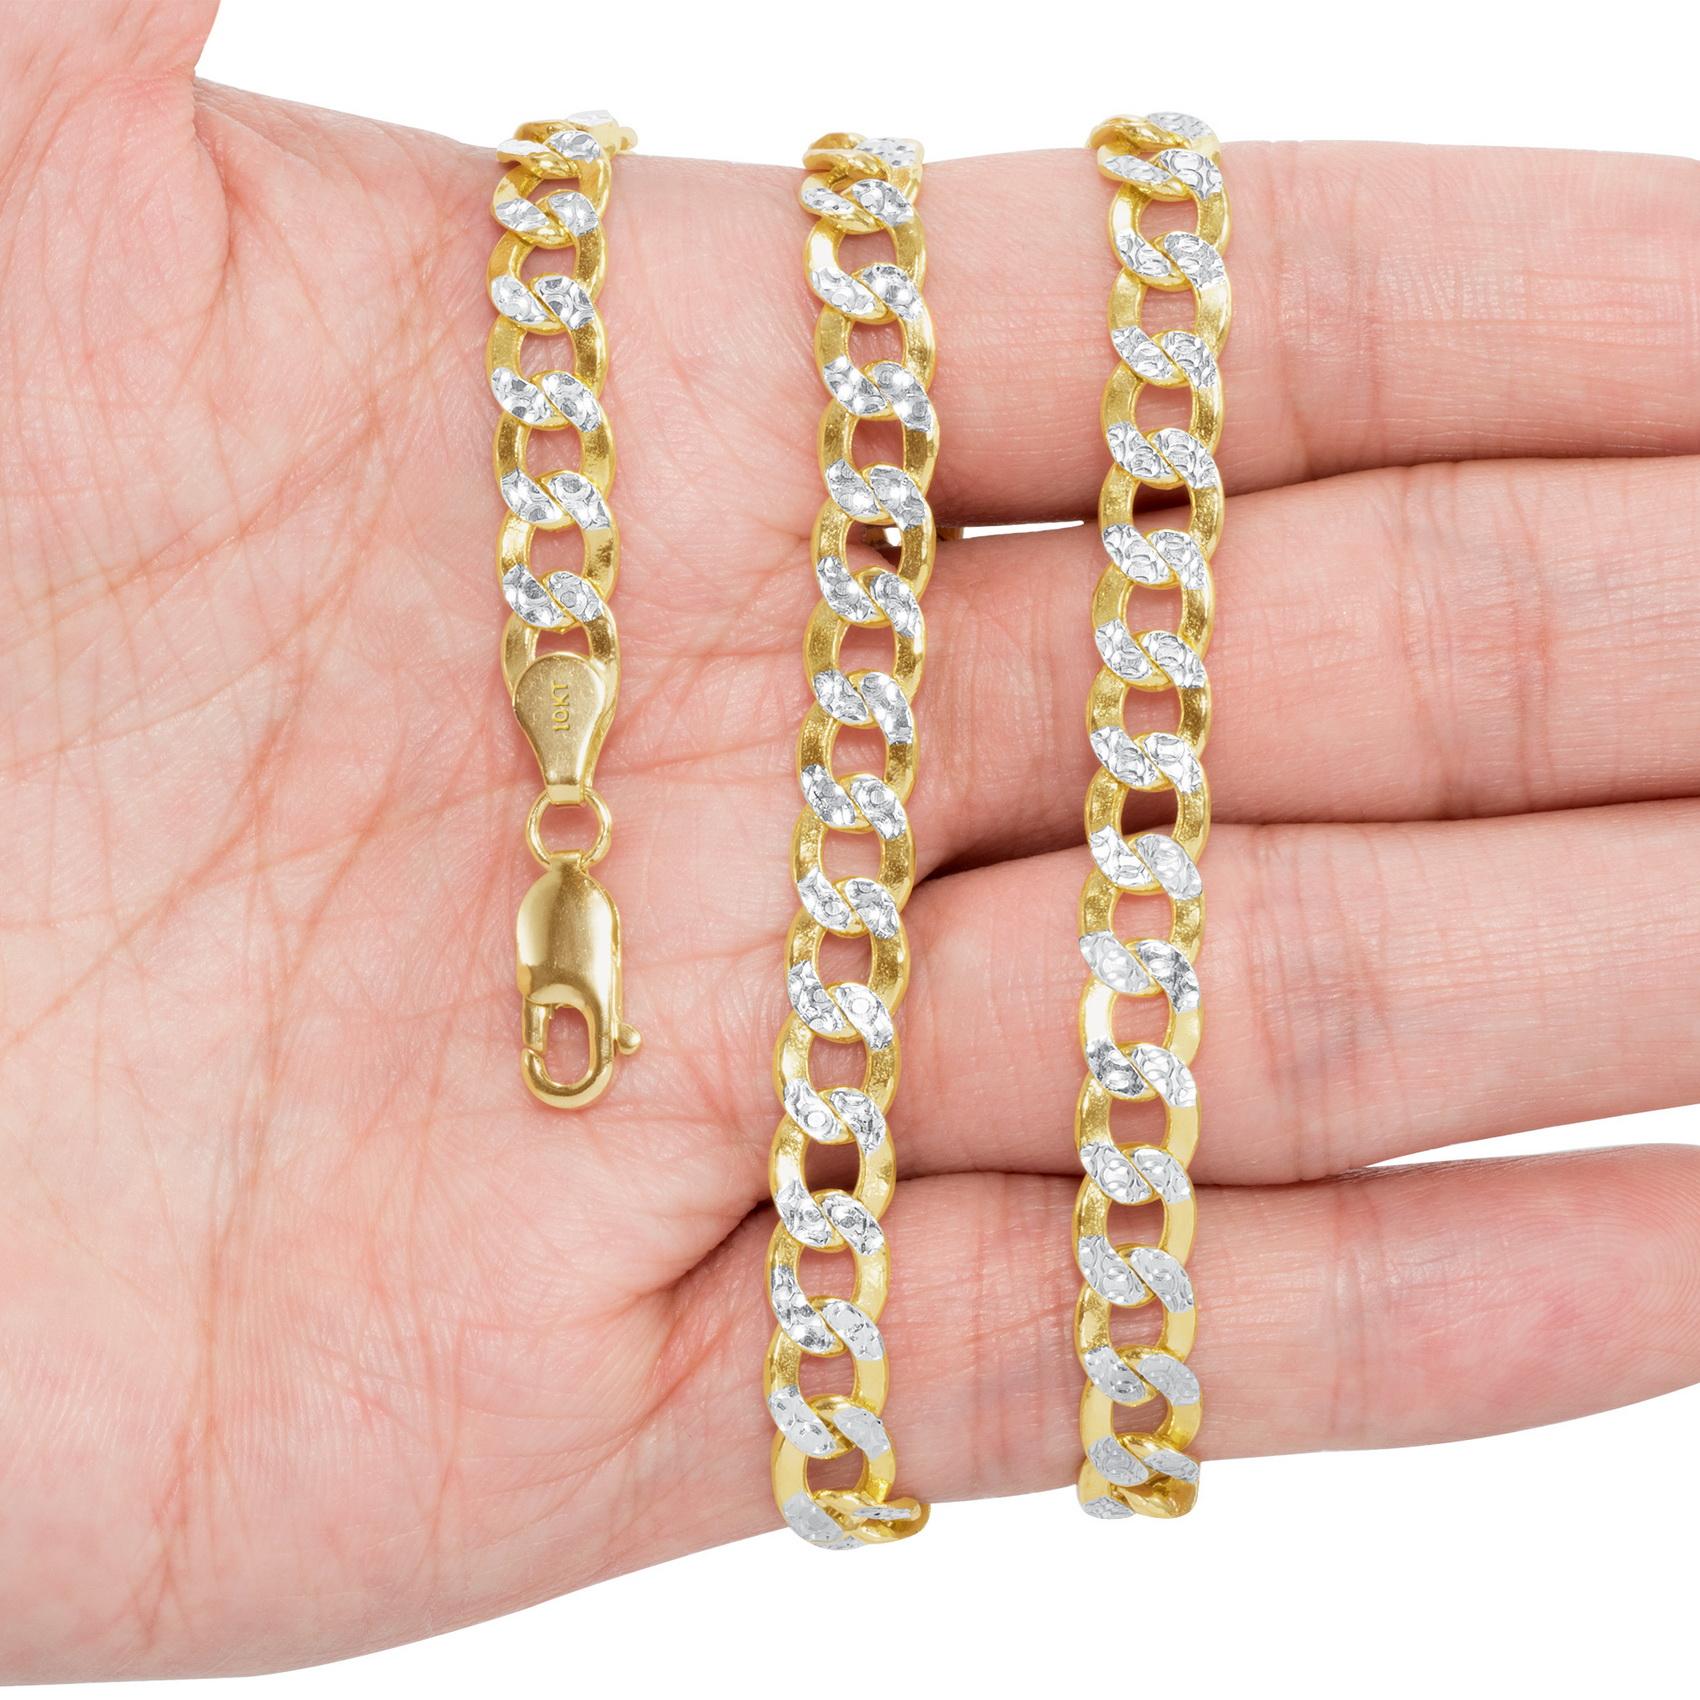 10K-Yellow-Gold-2mm-10-5mm-Diamond-Cut-Pave-Cuban-Chain-Necklace-Bracelet-7-034-30-034 thumbnail 25